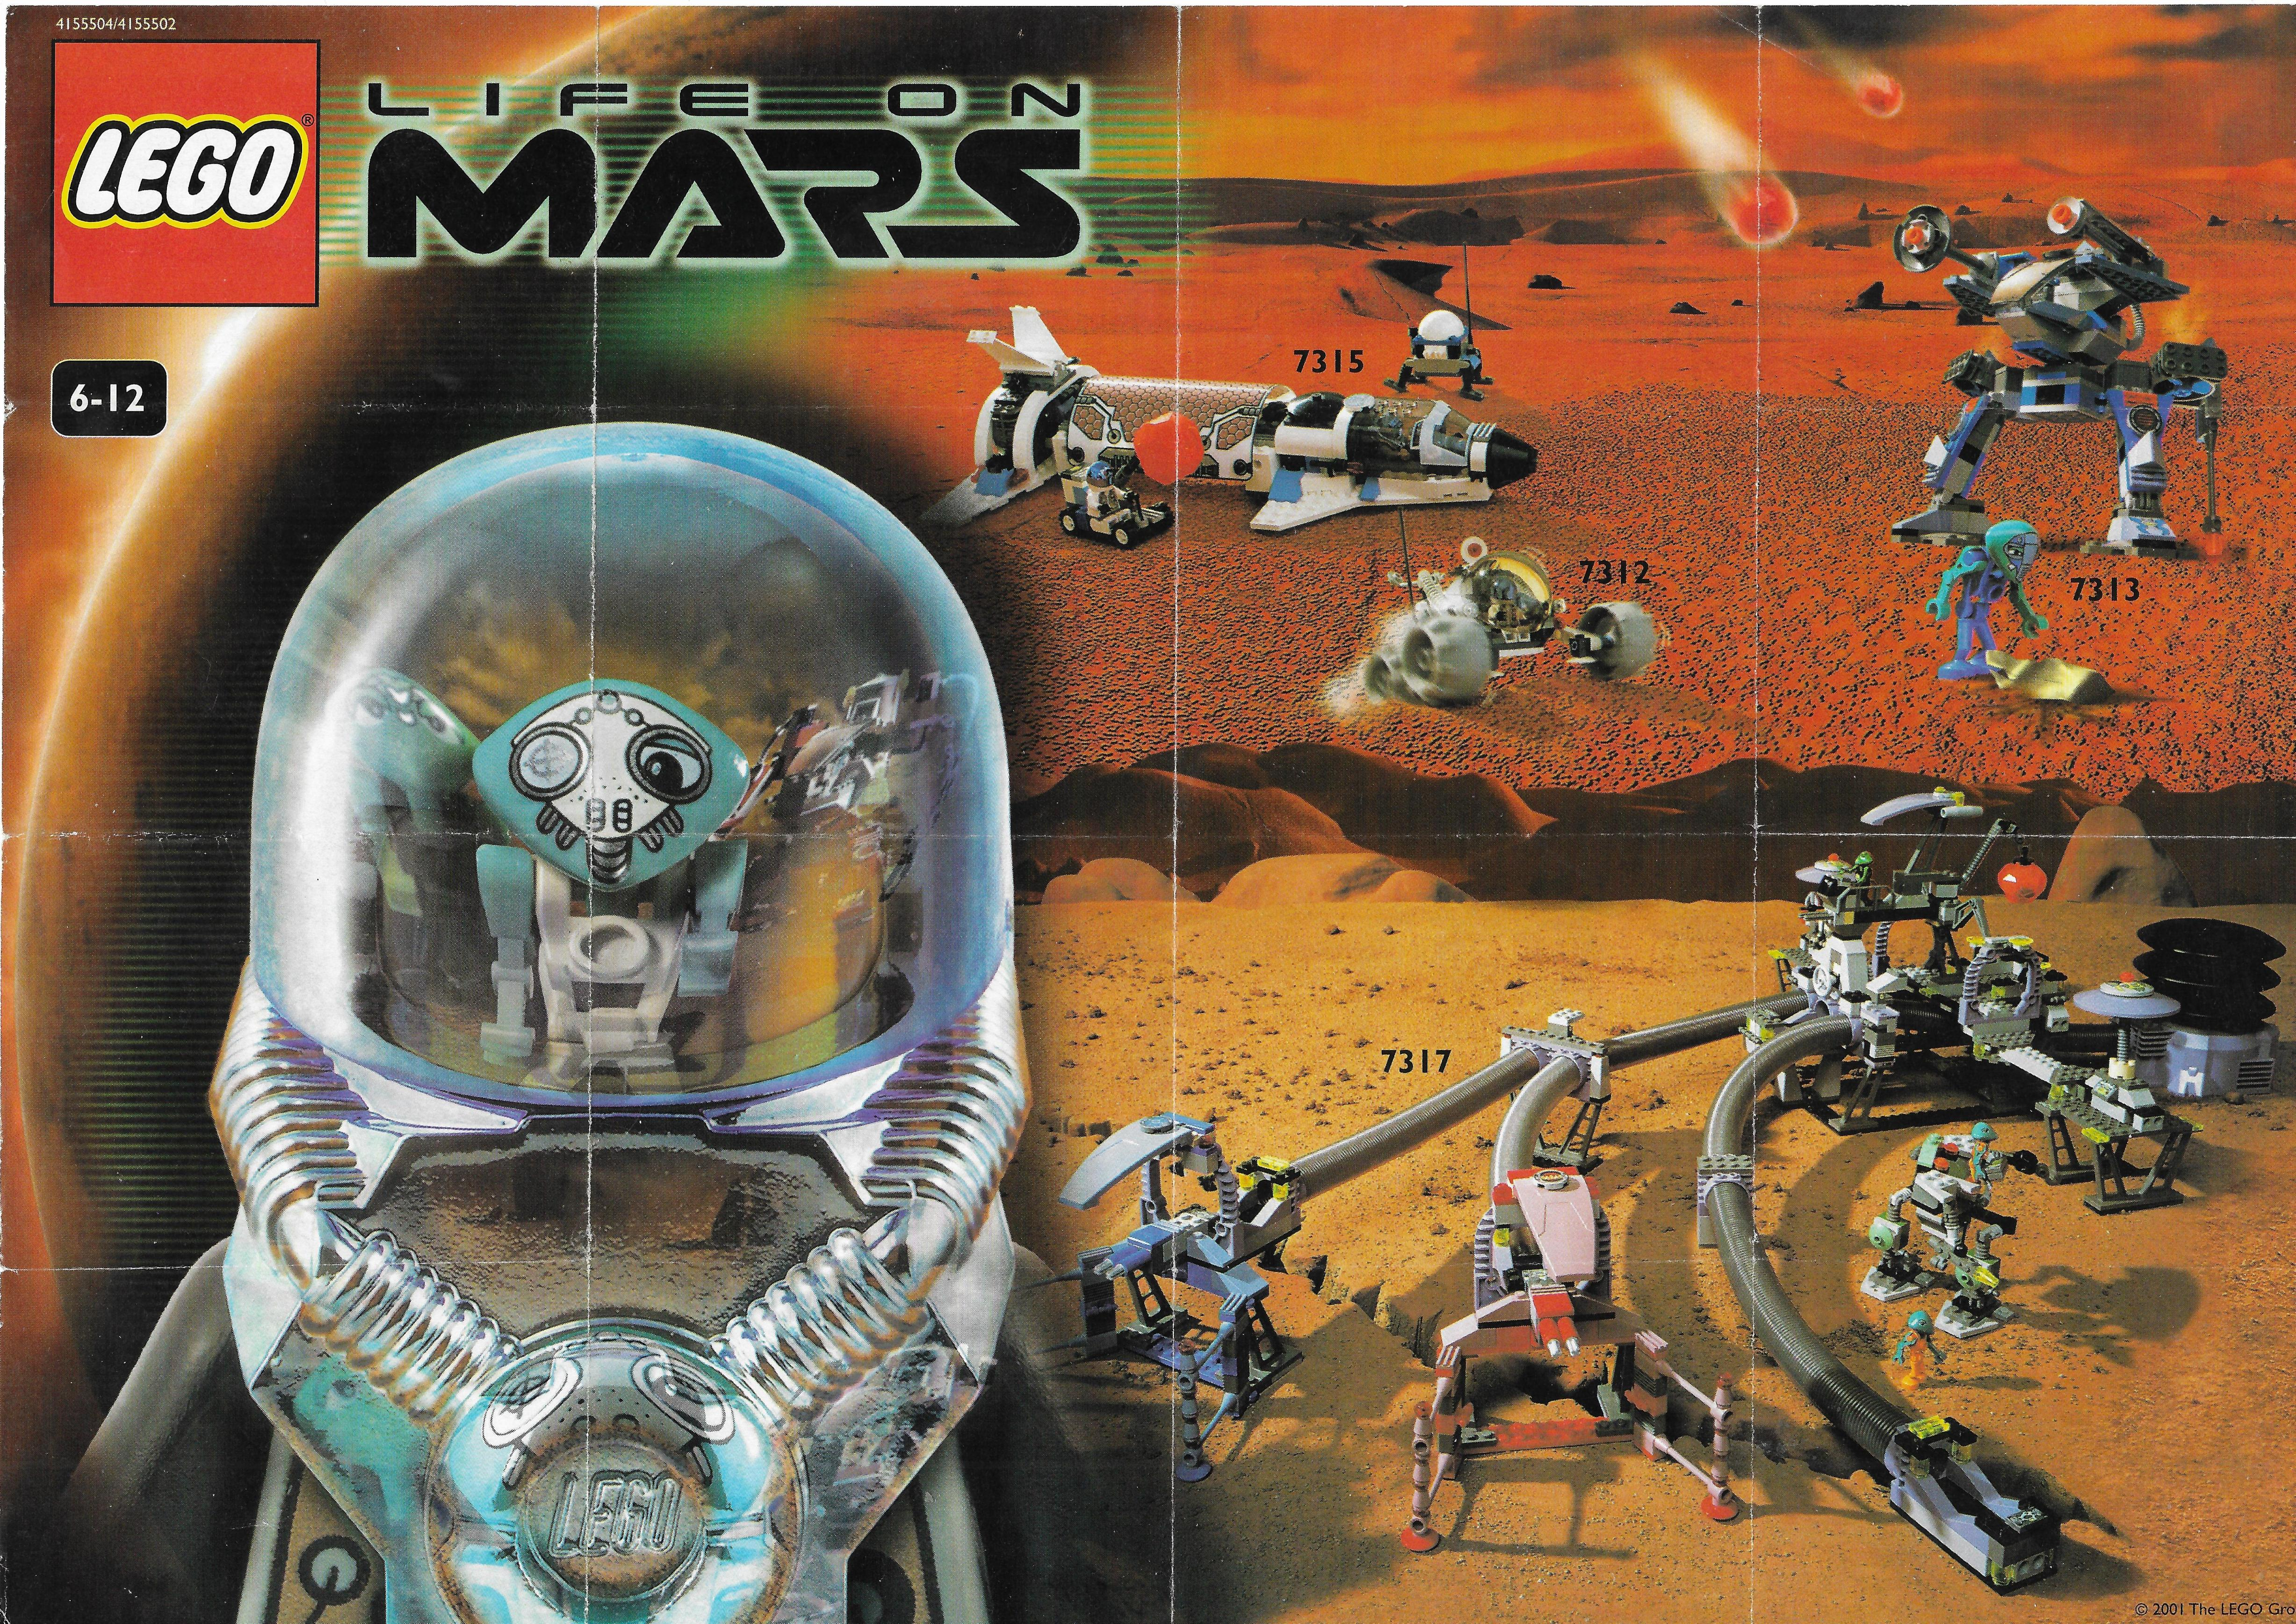 Lego Life on Mars insert 2001-ből